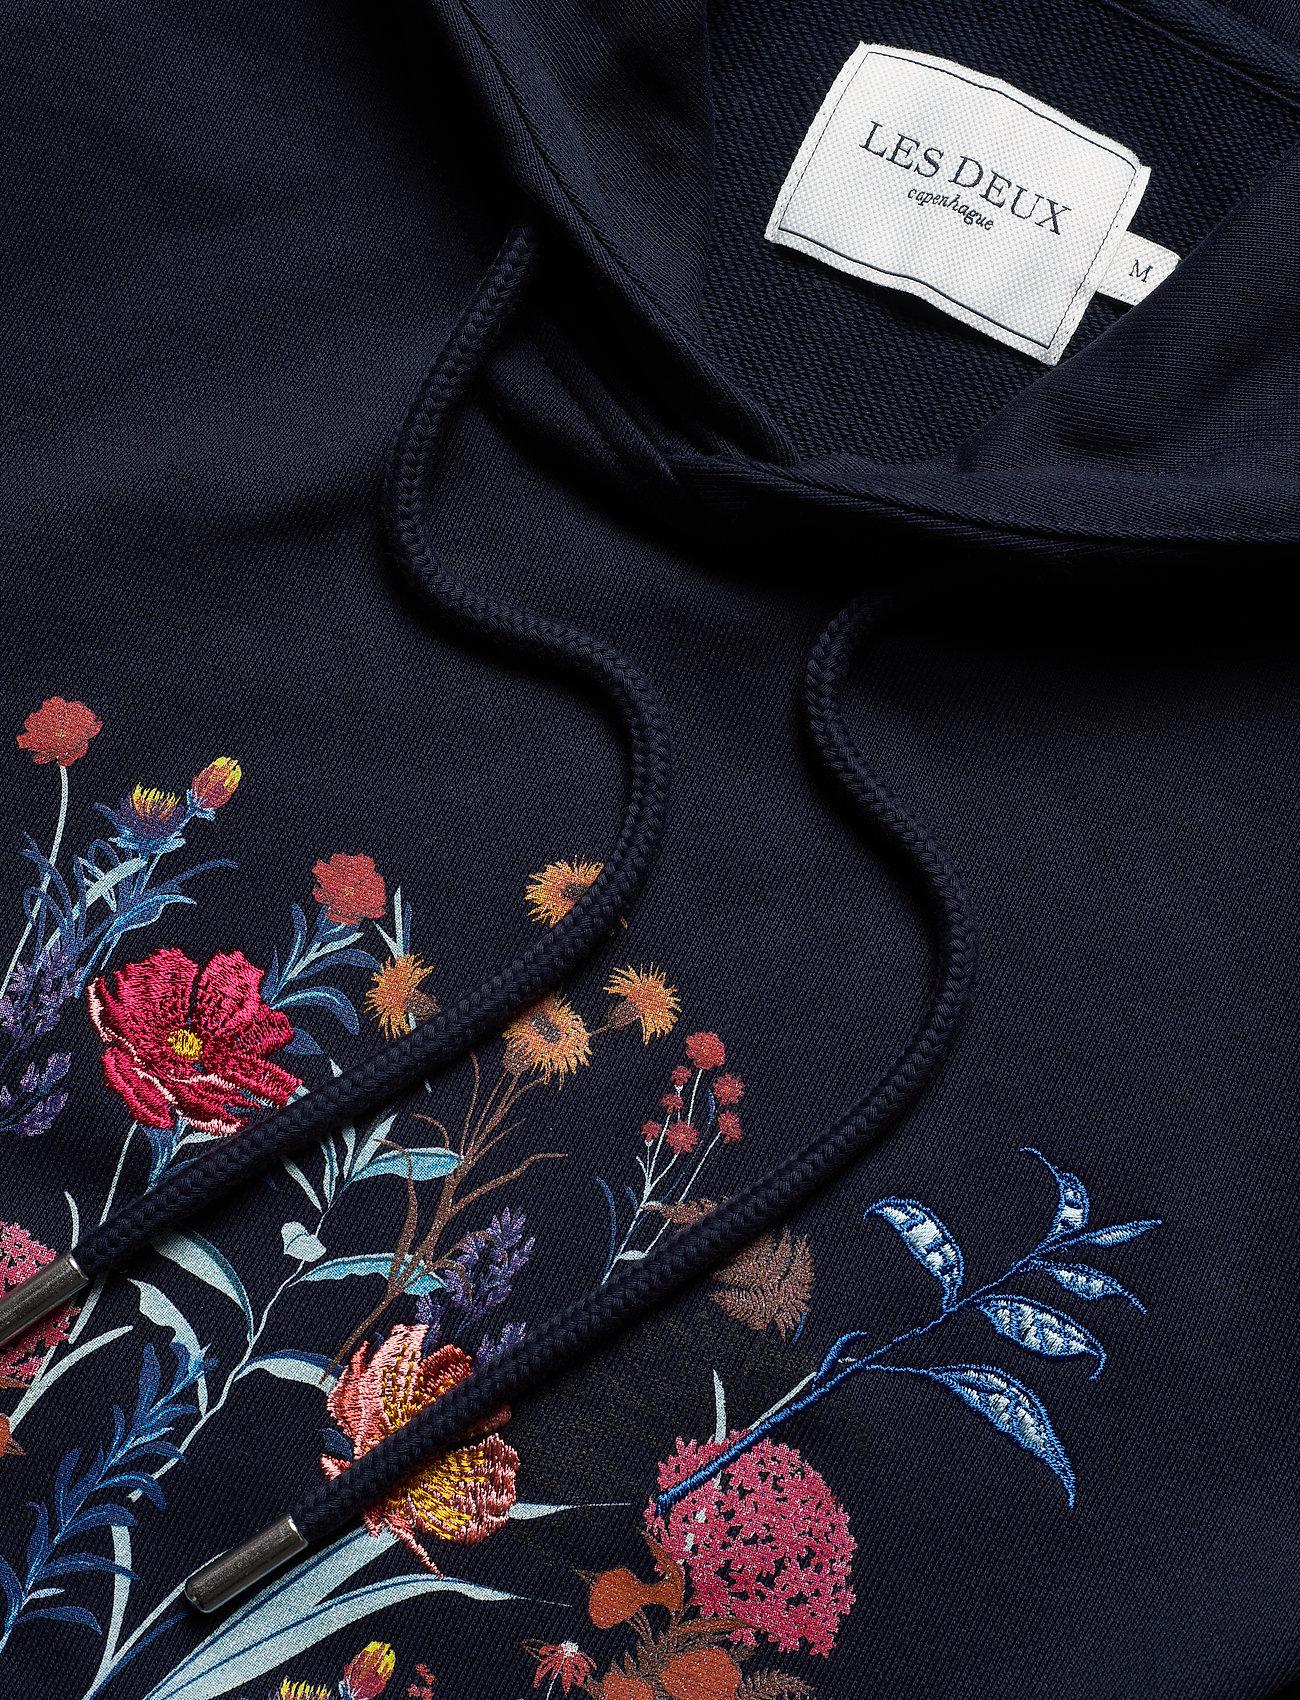 Les Deux Fleur D'été Hoodie - Sweatshirts Dark Navy/dark Papaya Flower Pattern